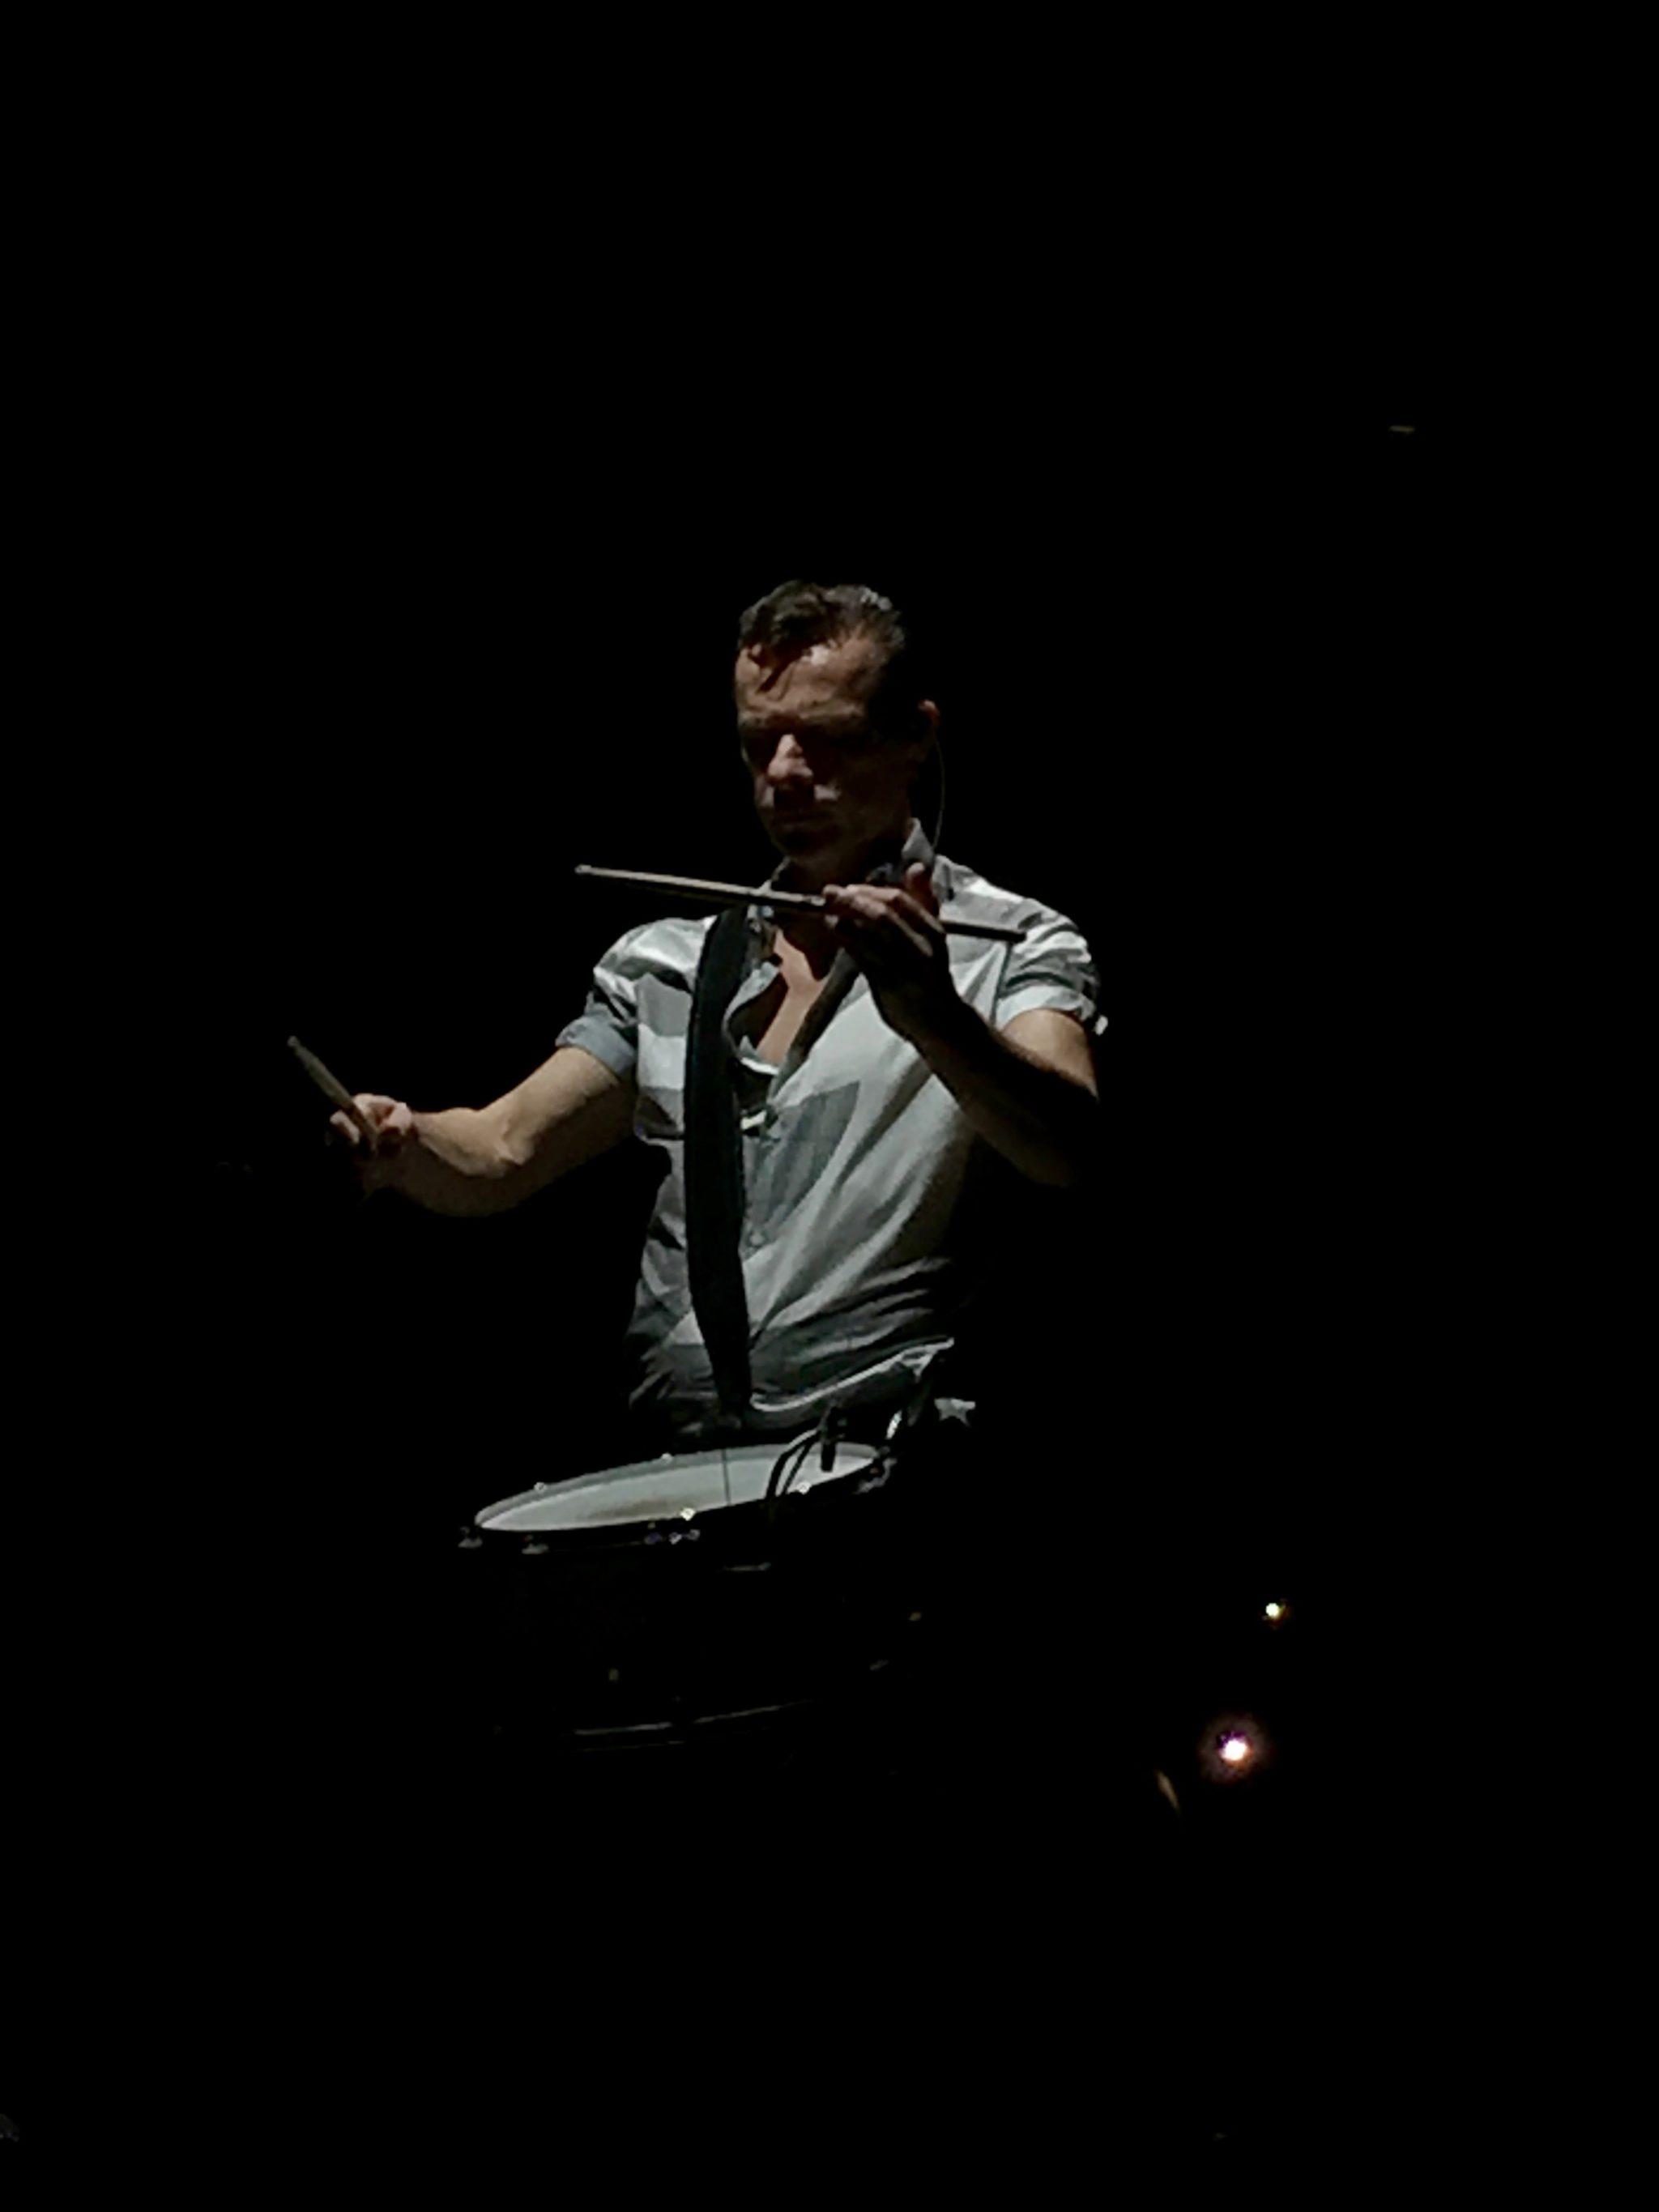 Larry Mullen Jr. of U2 performing live